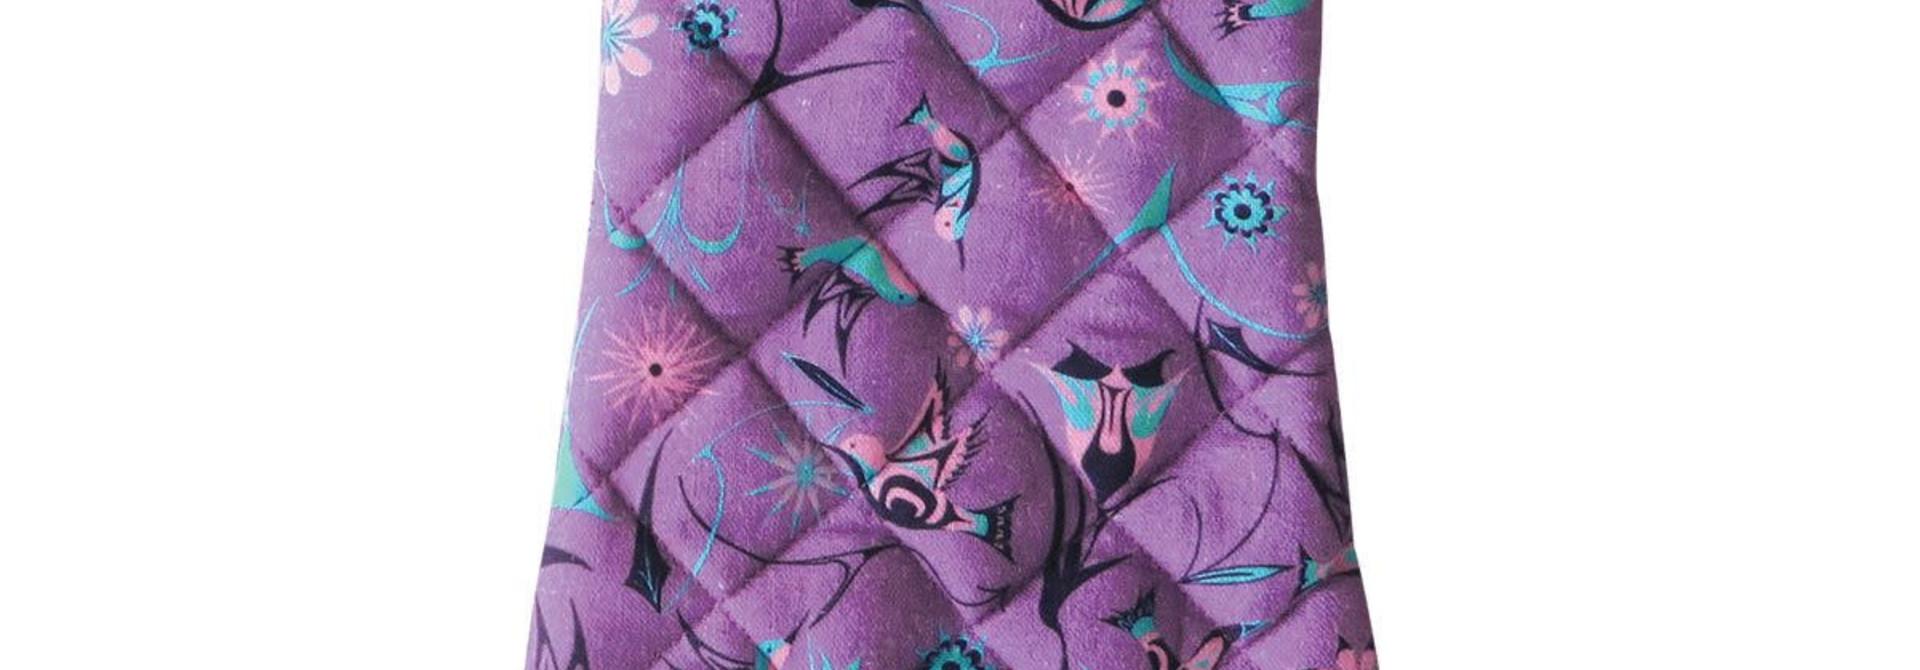 Oven Mitt-Hummingbirds by Nikki LaRock